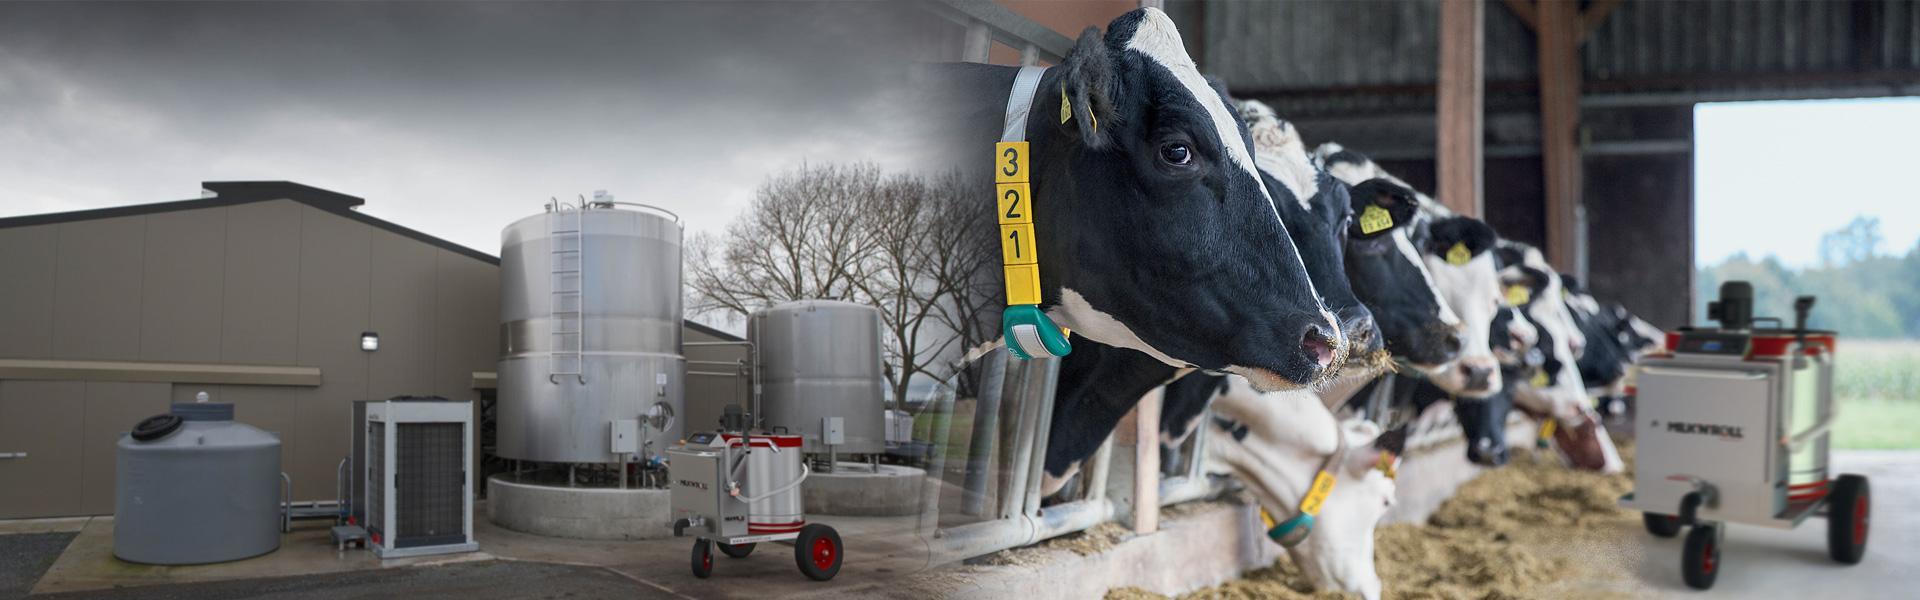 Milk Taxi For Dairy Farm